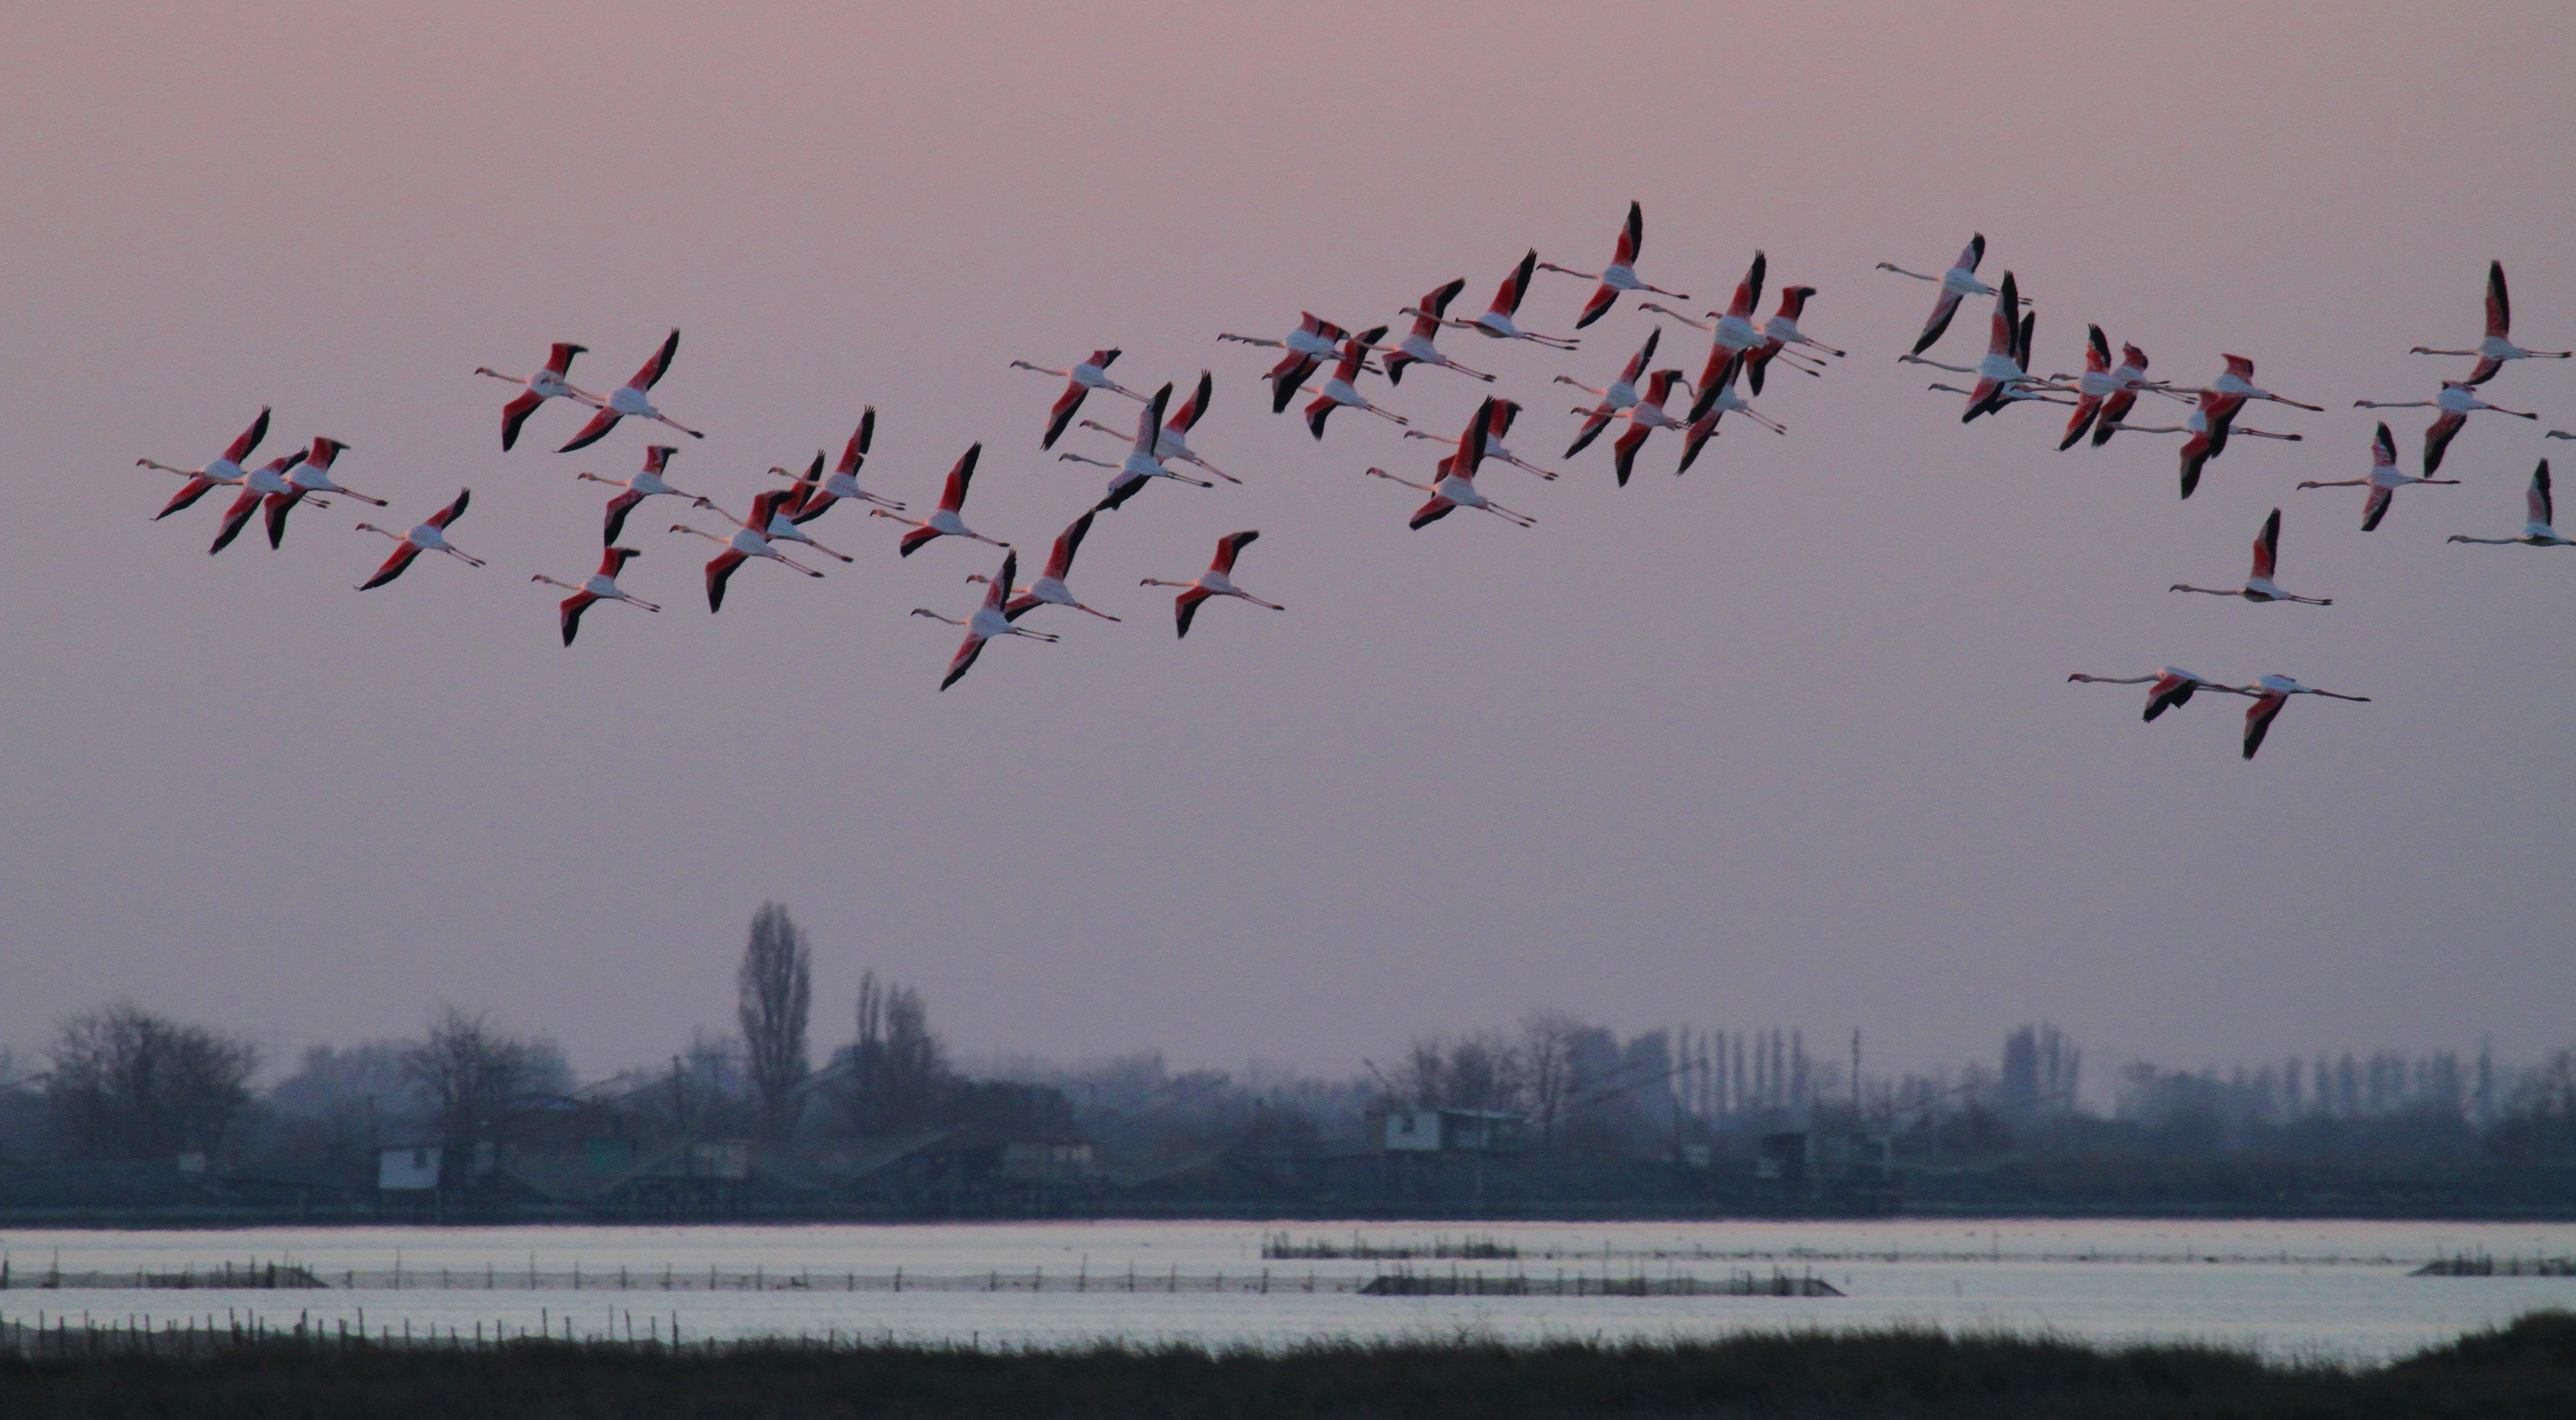 File:Fenicotteri rosa, ultimi voli serali - panoramio.jpg